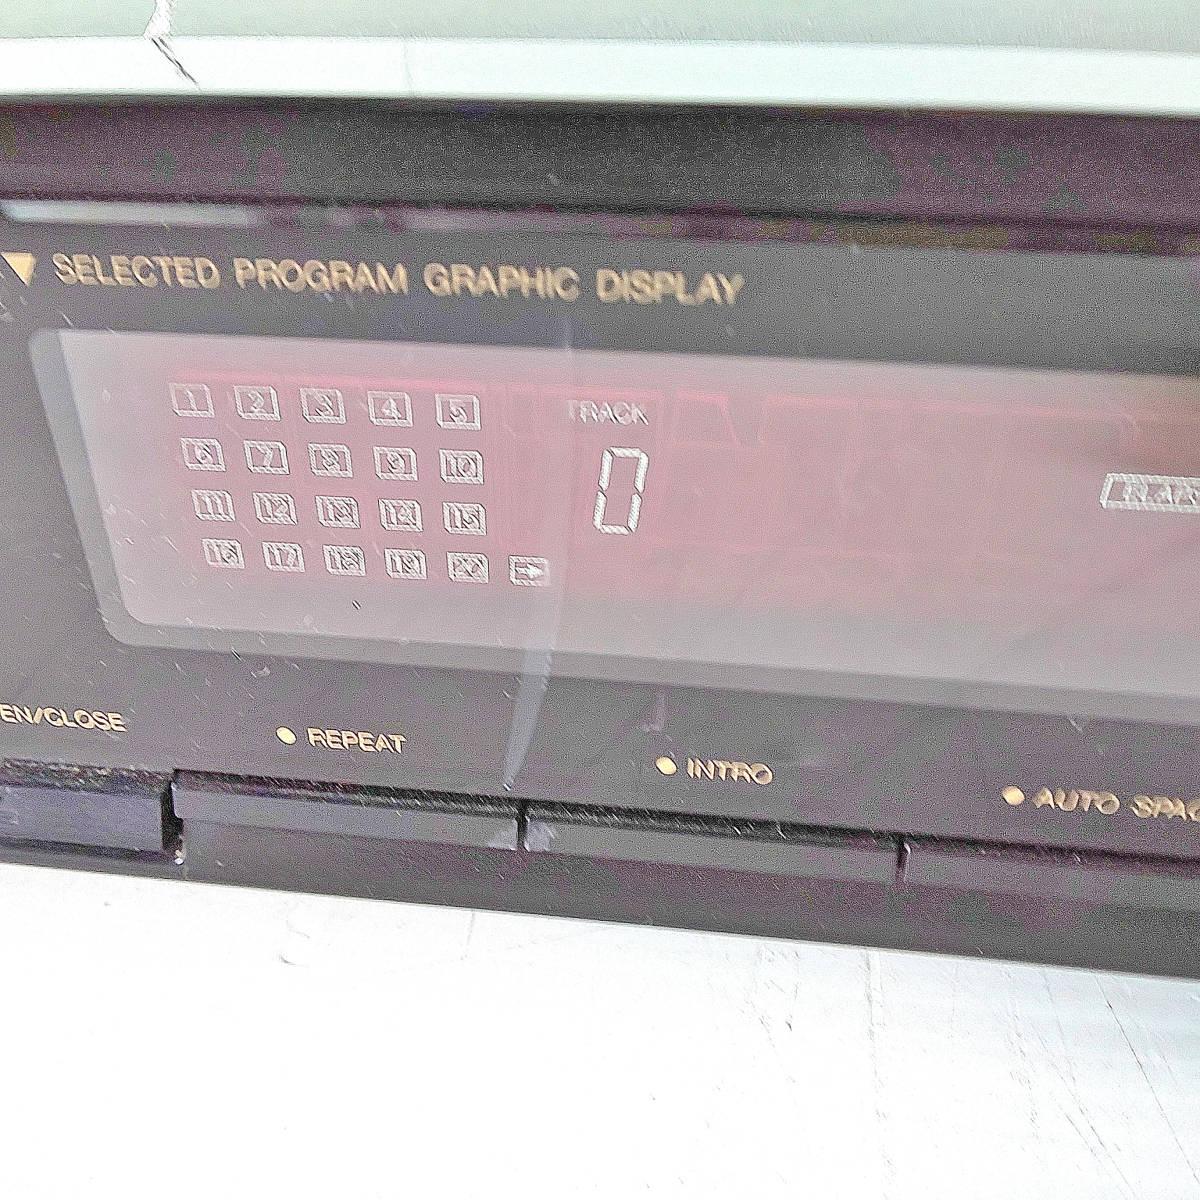 ◆NEC COMPACT DISC PLAYER MODEL CD-410 CDプレーヤー_画像3